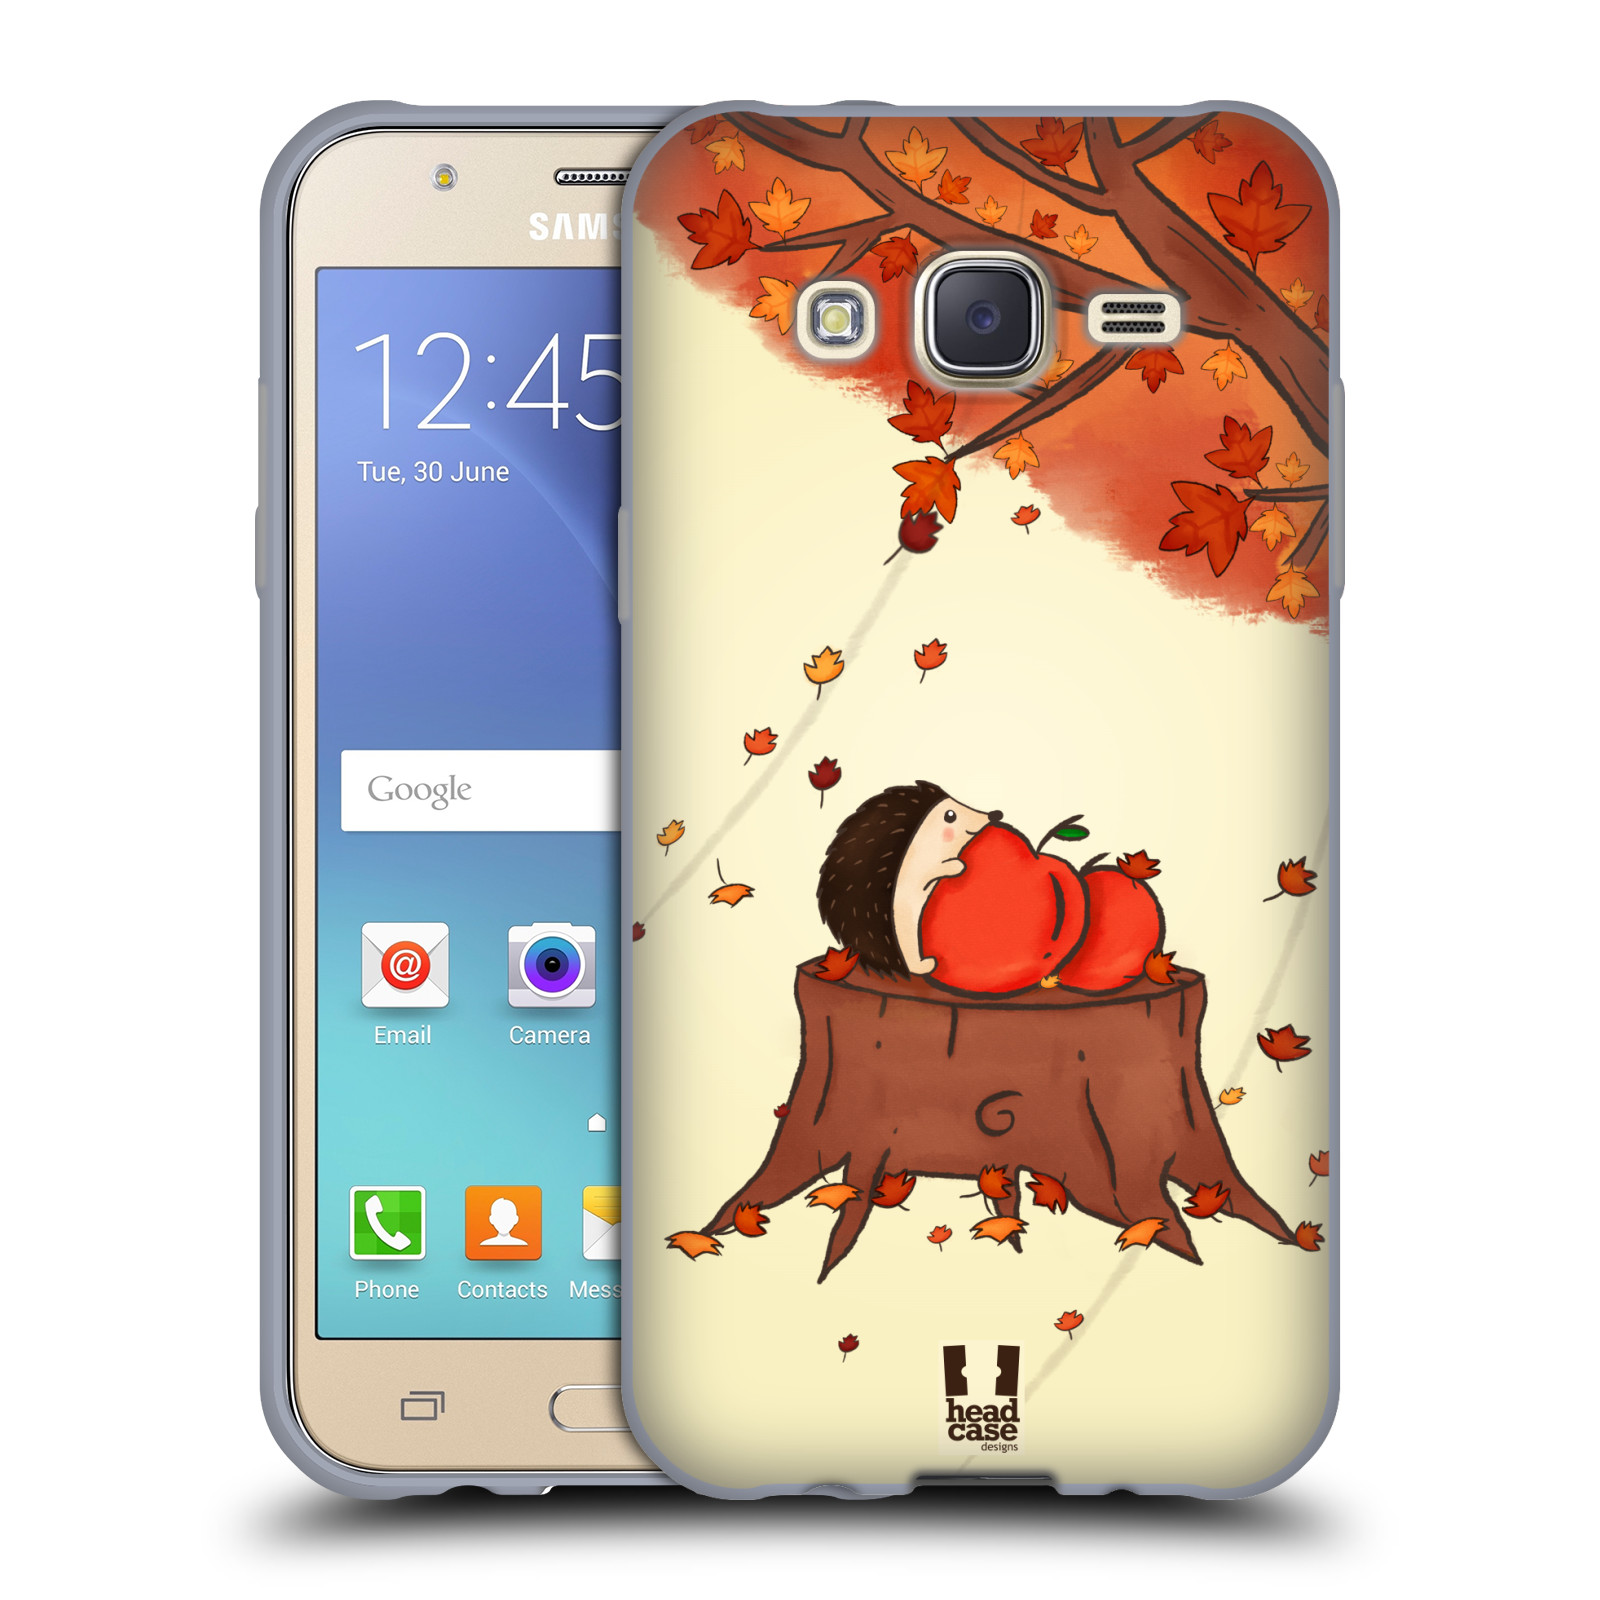 HEAD CASE silikonový obal na mobil Samsung Galaxy J5, J500, (J5 DUOS) vzor podzimní zvířátka ježek a jablíčka